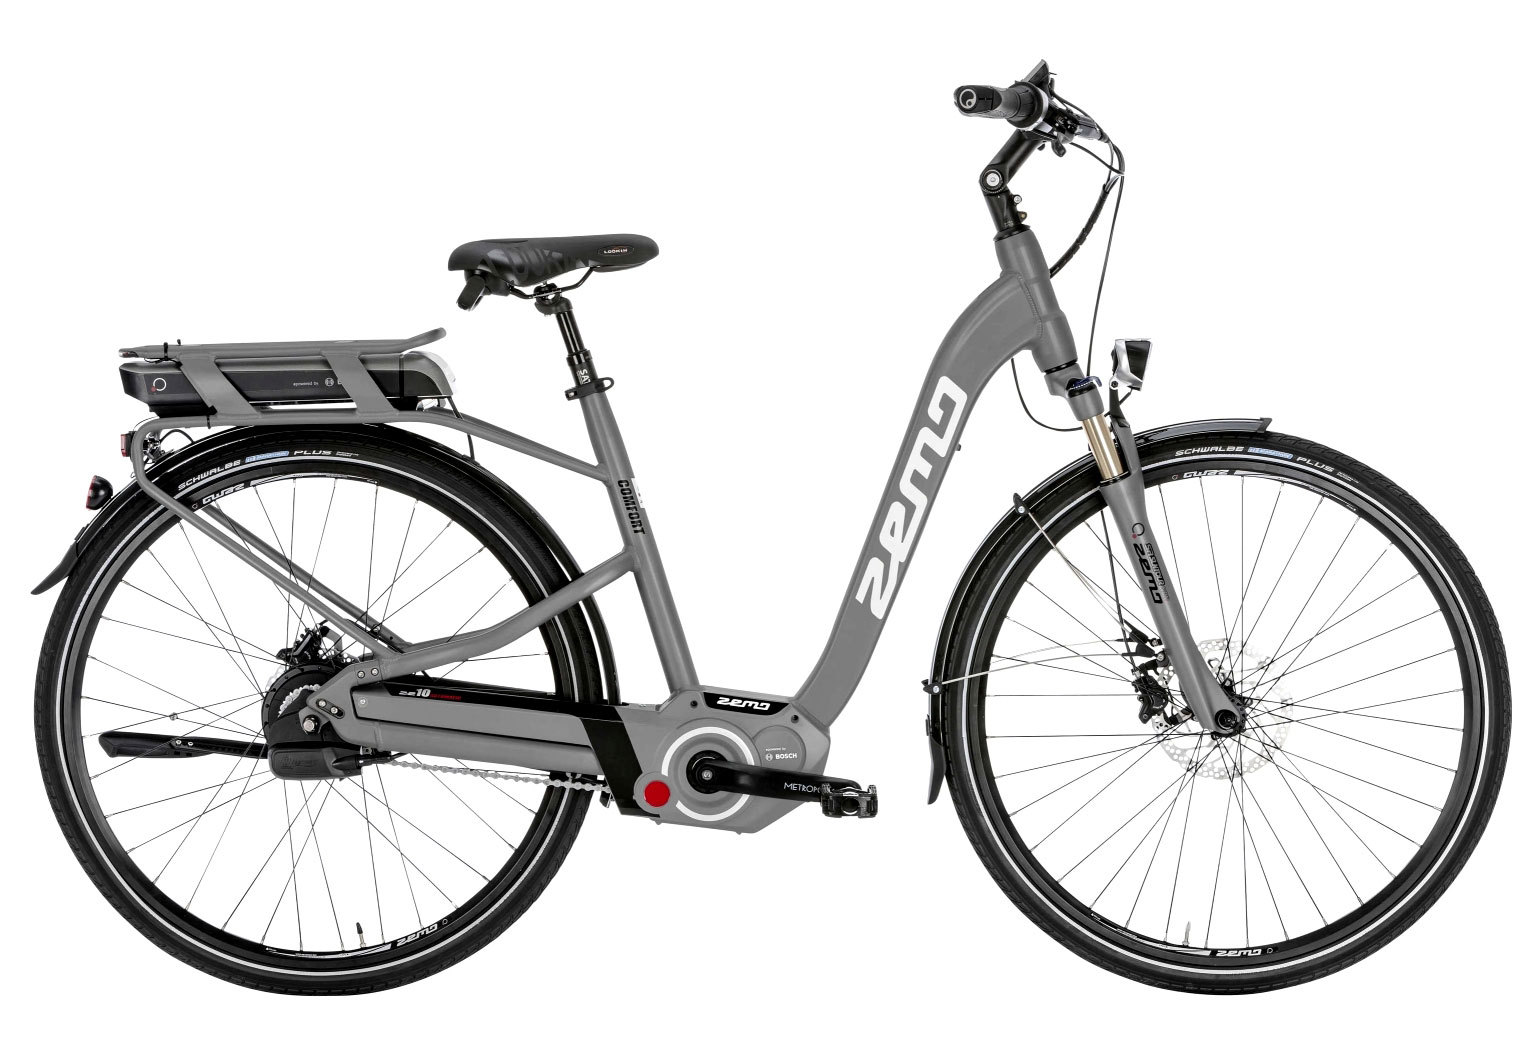 elektro fahrrad zemo ze 10 e bike bosch nuvinci harmony grau 50 cm uvp 3199 ebay. Black Bedroom Furniture Sets. Home Design Ideas